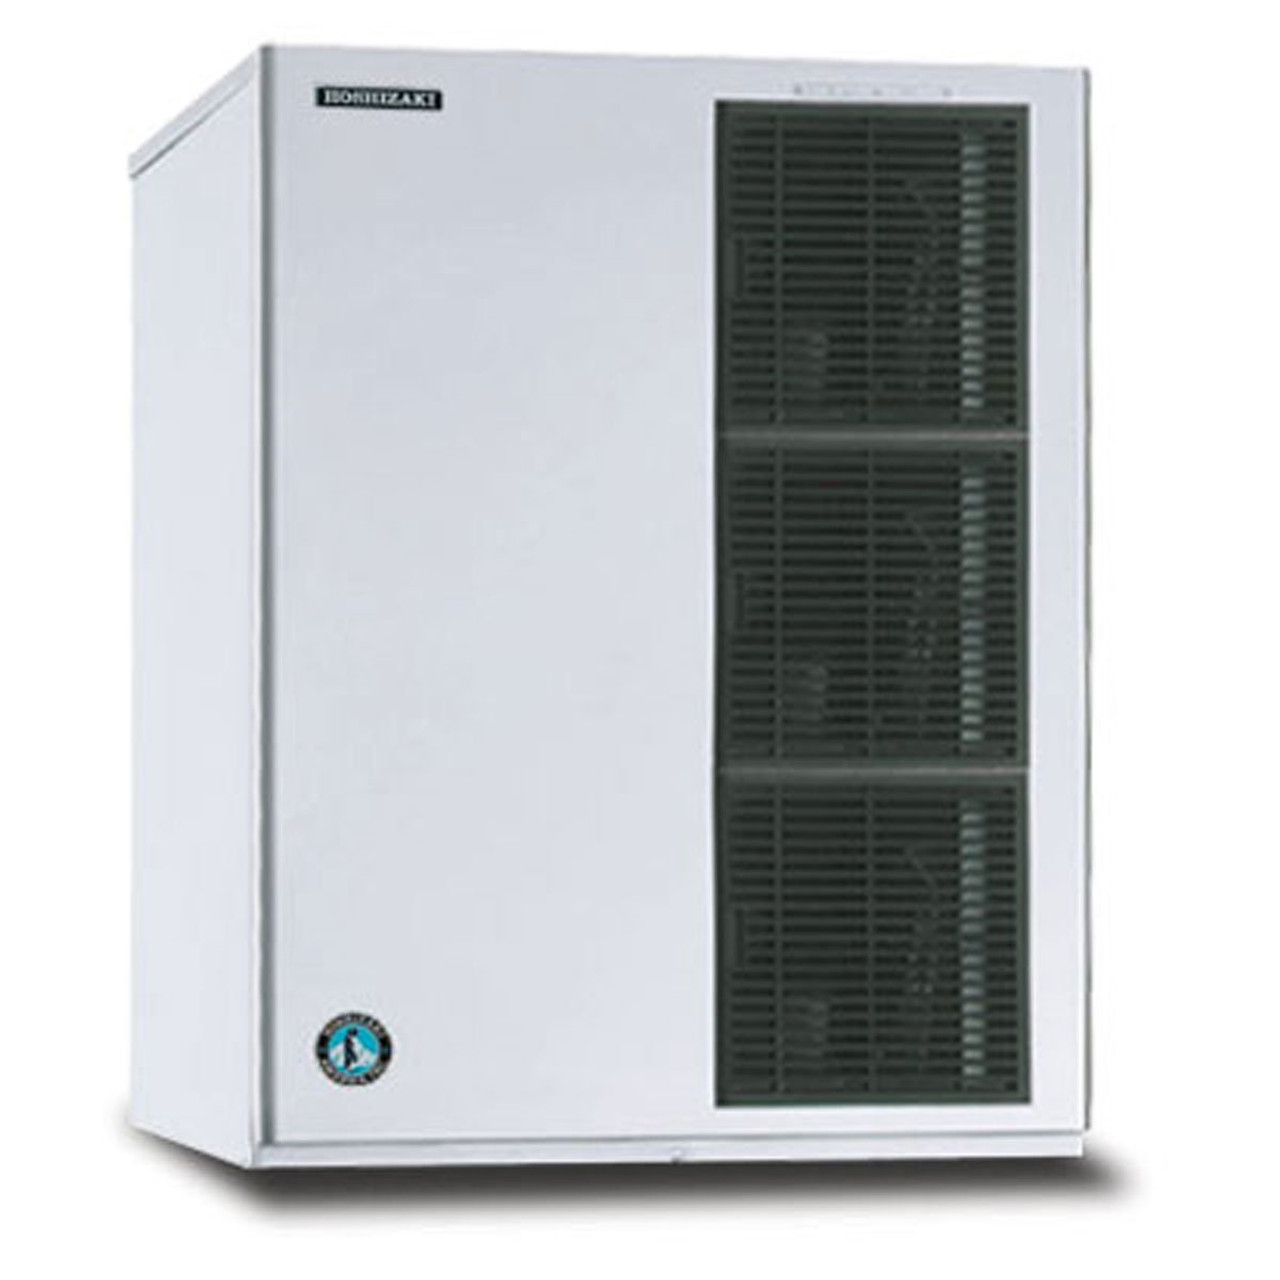 Hoshizaki Km 1340mah 1401 Lbs Series Ice Maker Machine Best Price Guarantee Prima Supply